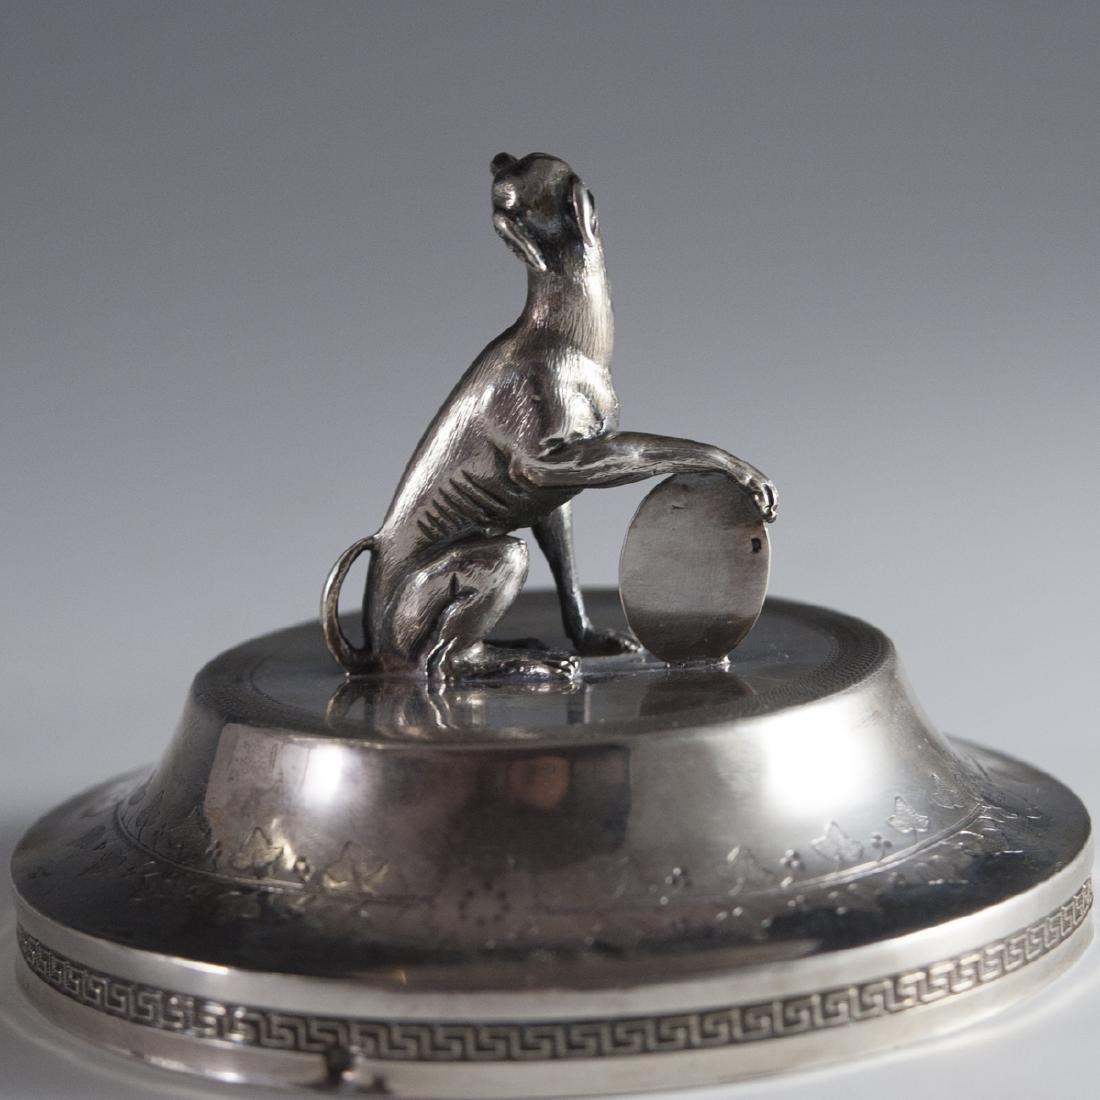 Antique Pierre Phillippe Rosseau Sterling Confiture Jar - 3